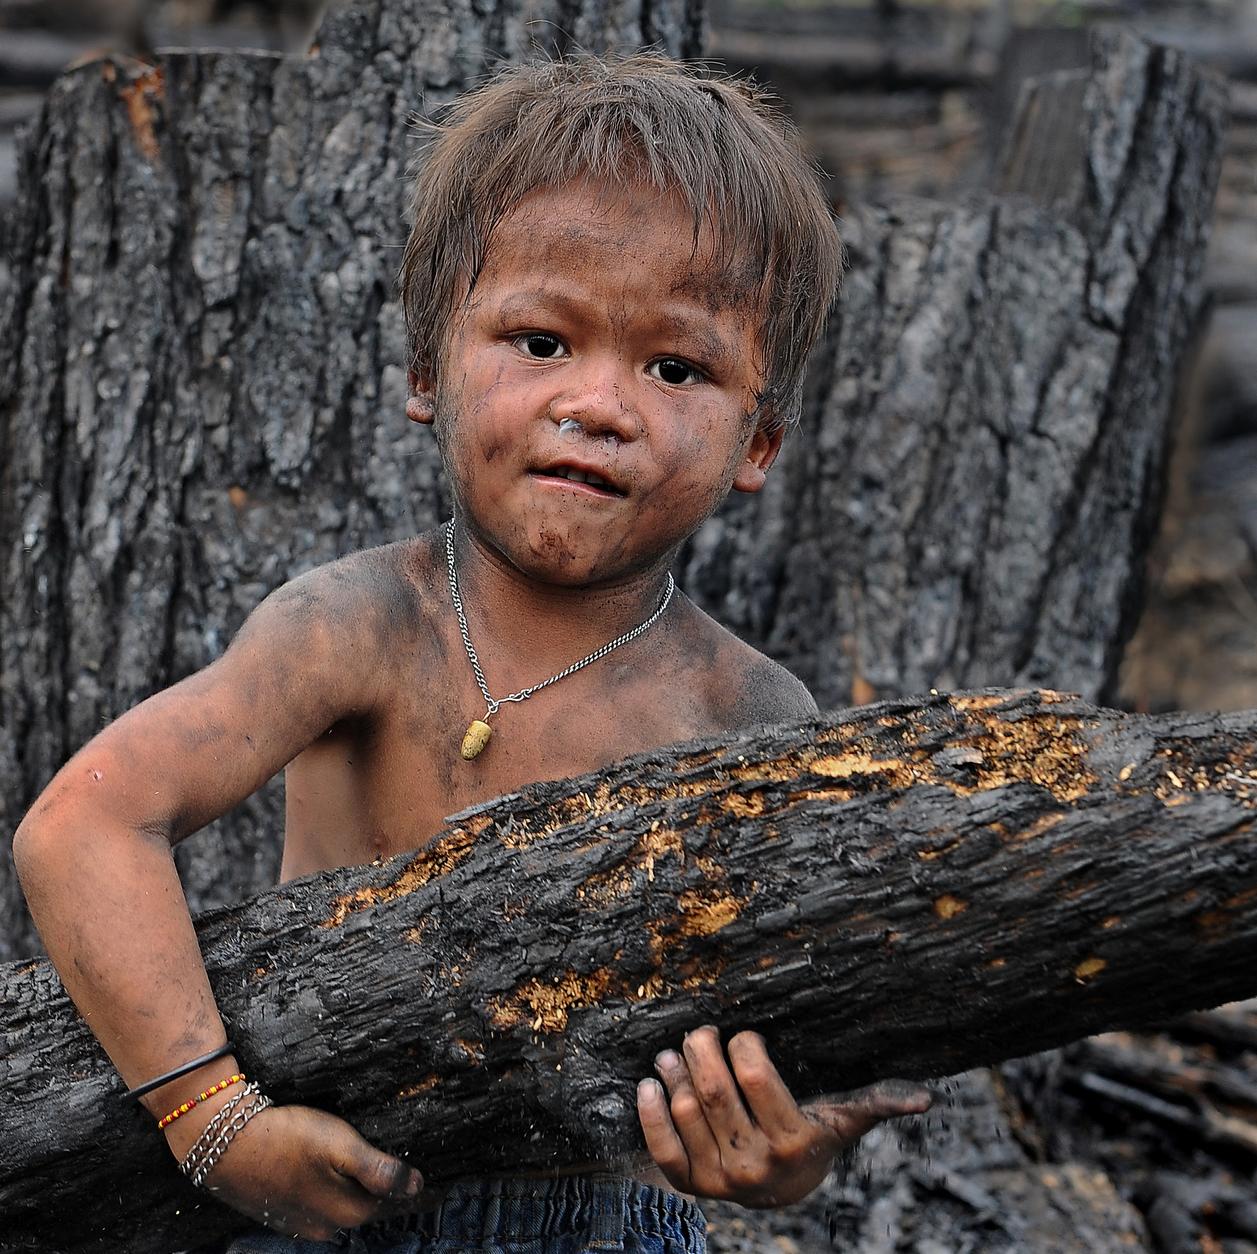 essay indian child labor